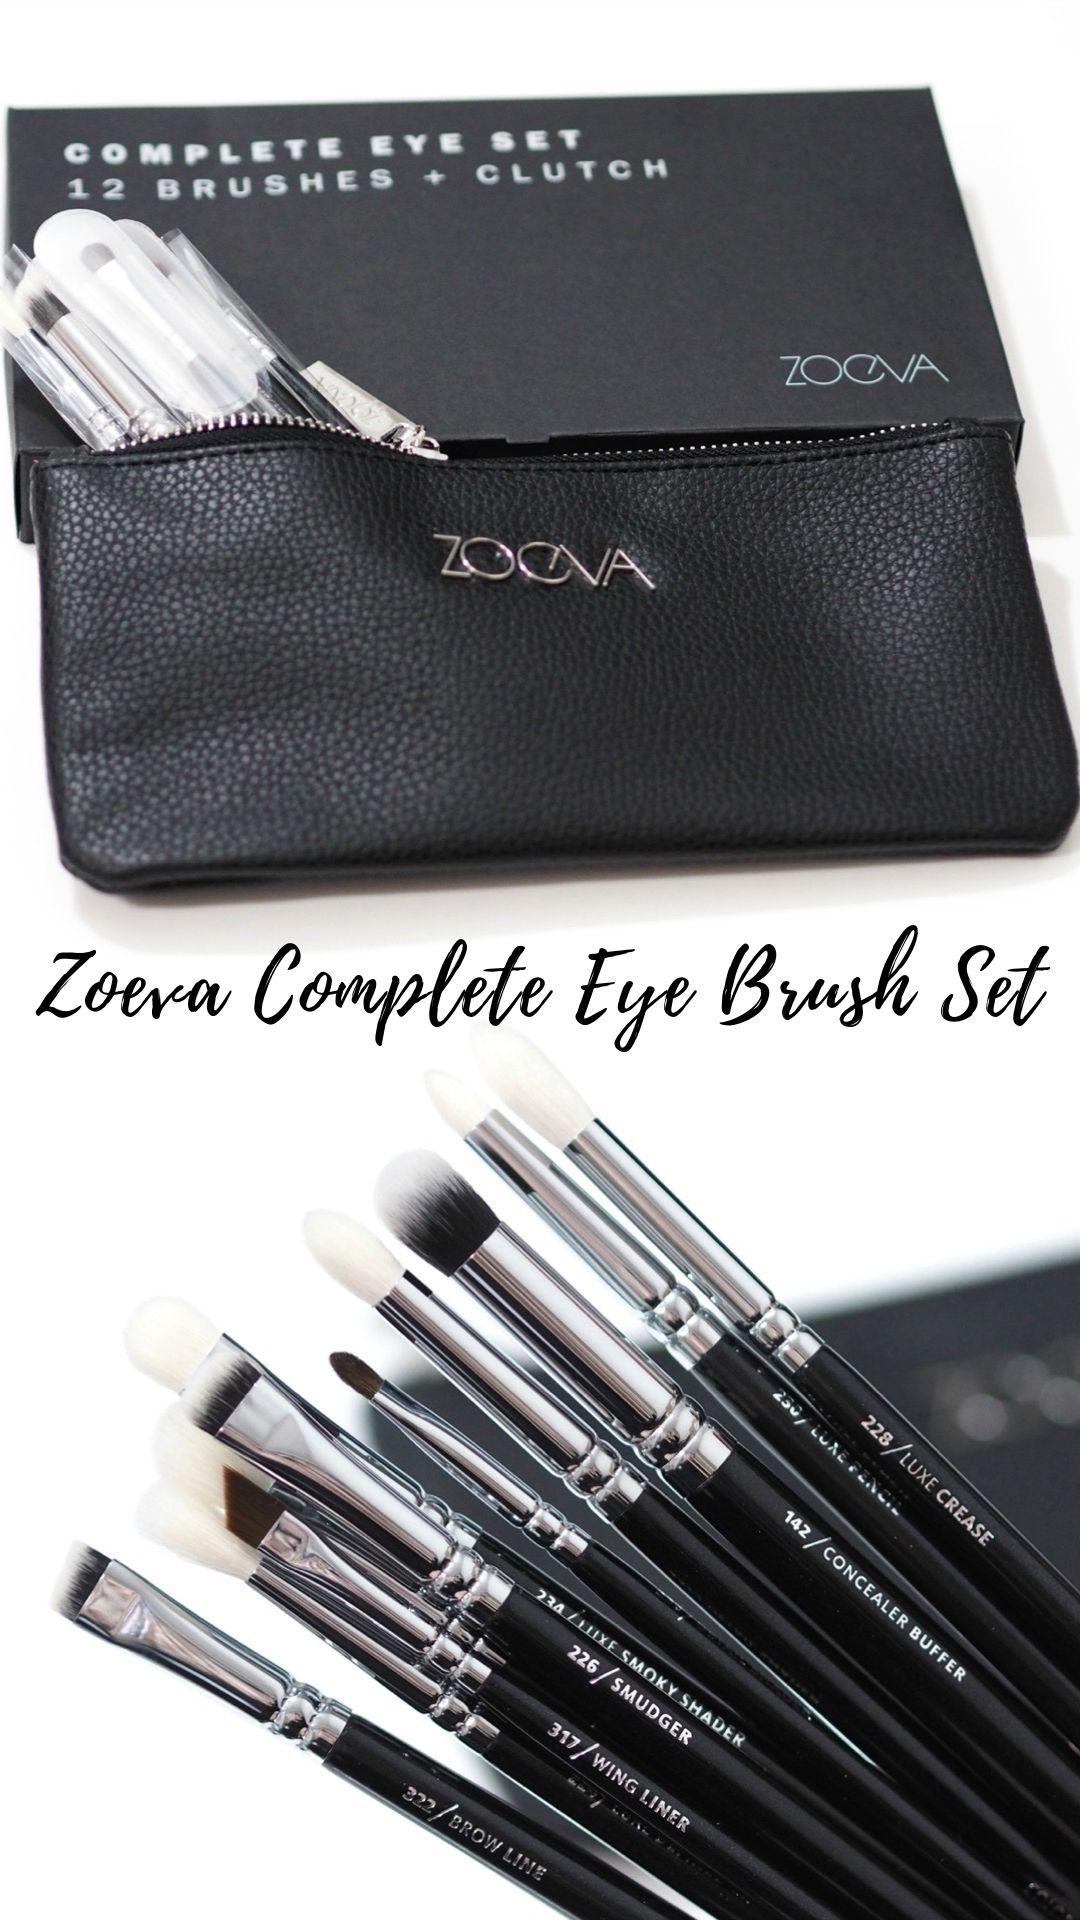 Zoeva Complete Eye Brush Set Review Eye brushes, Eye